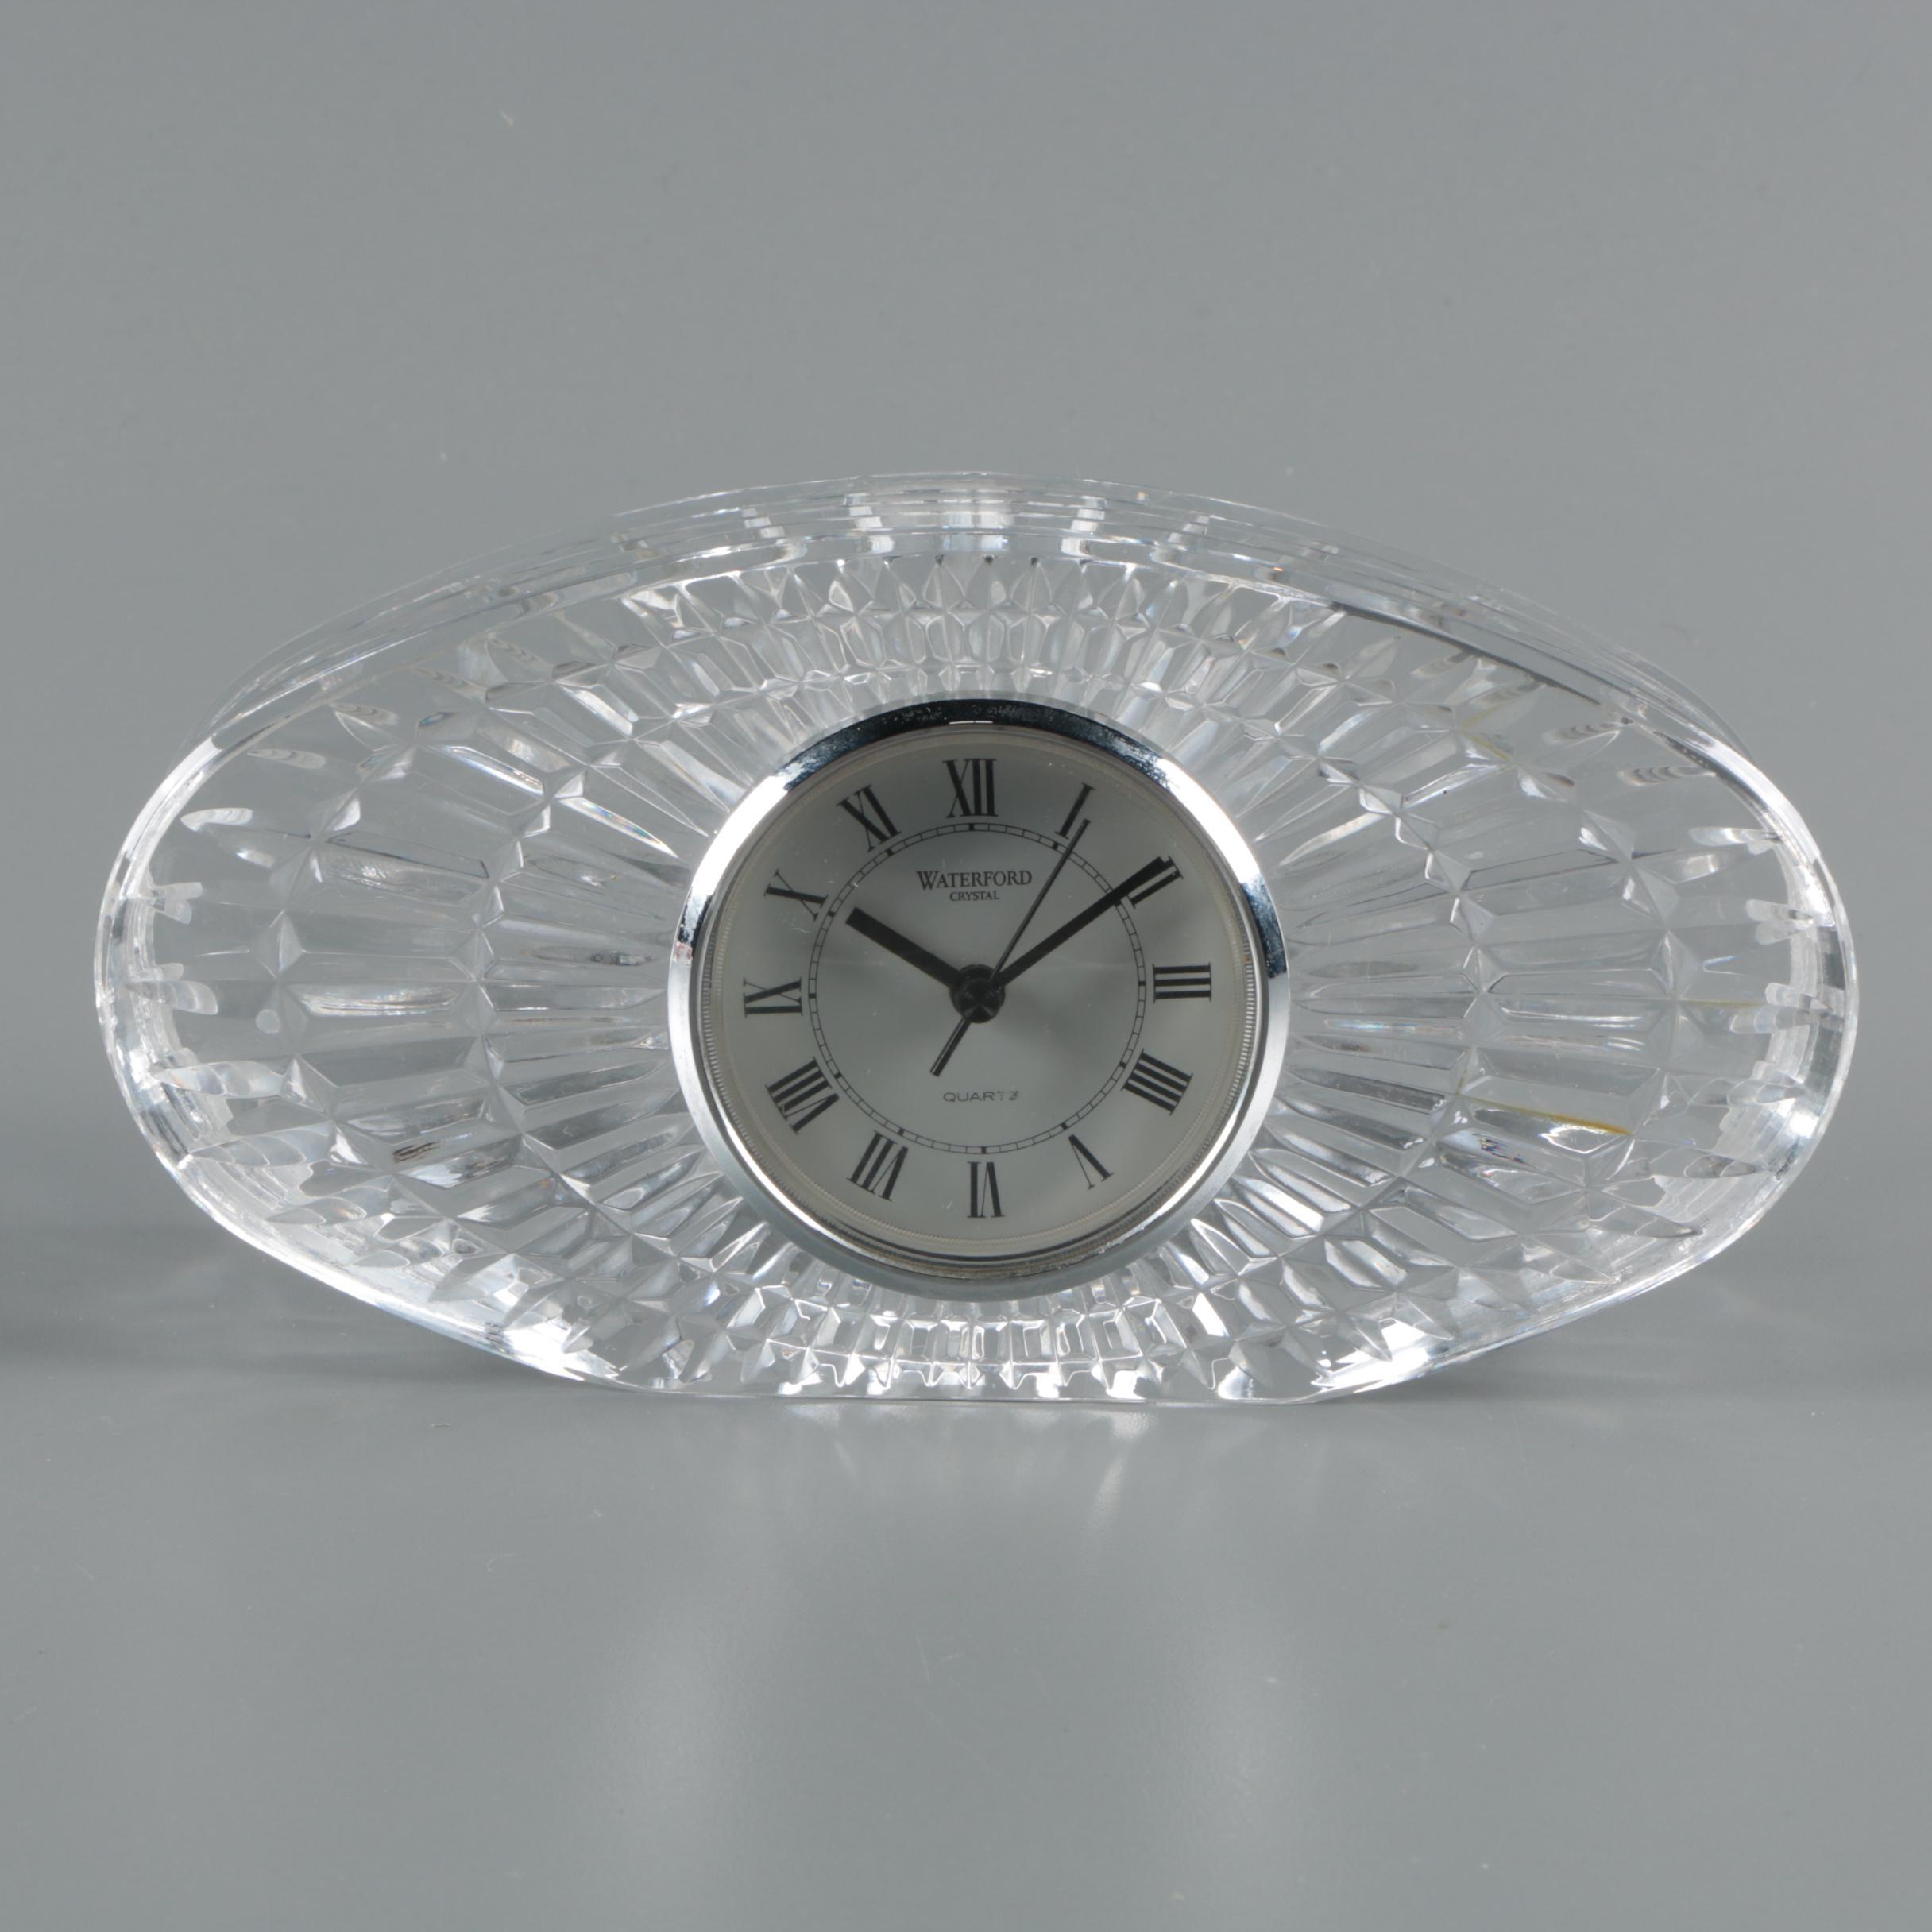 Waterford Crystal Quartz Desk Clock